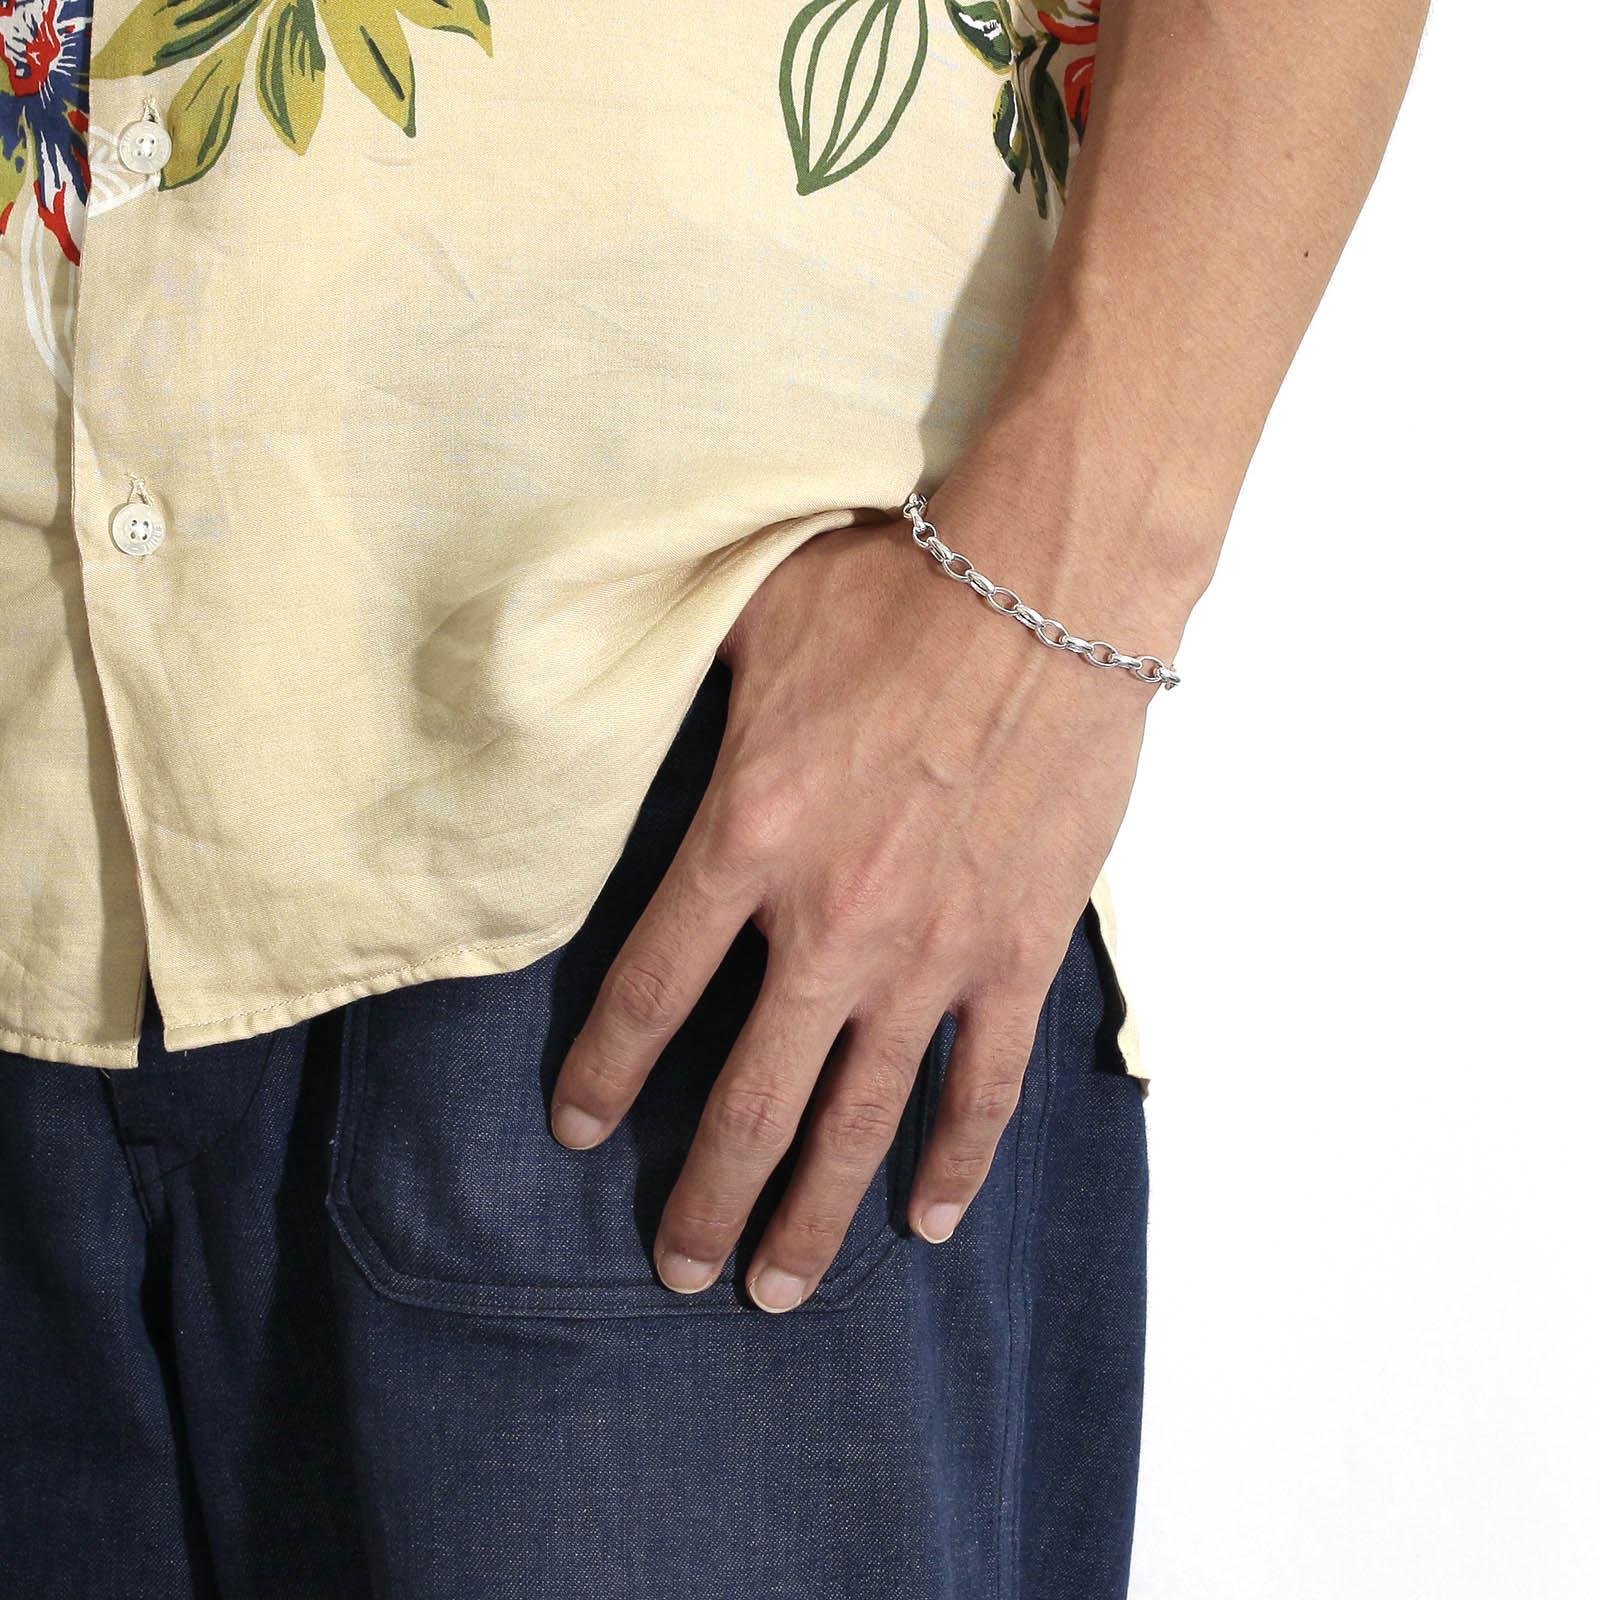 Hollow Chain Bracelet TYPE:2 - Silver